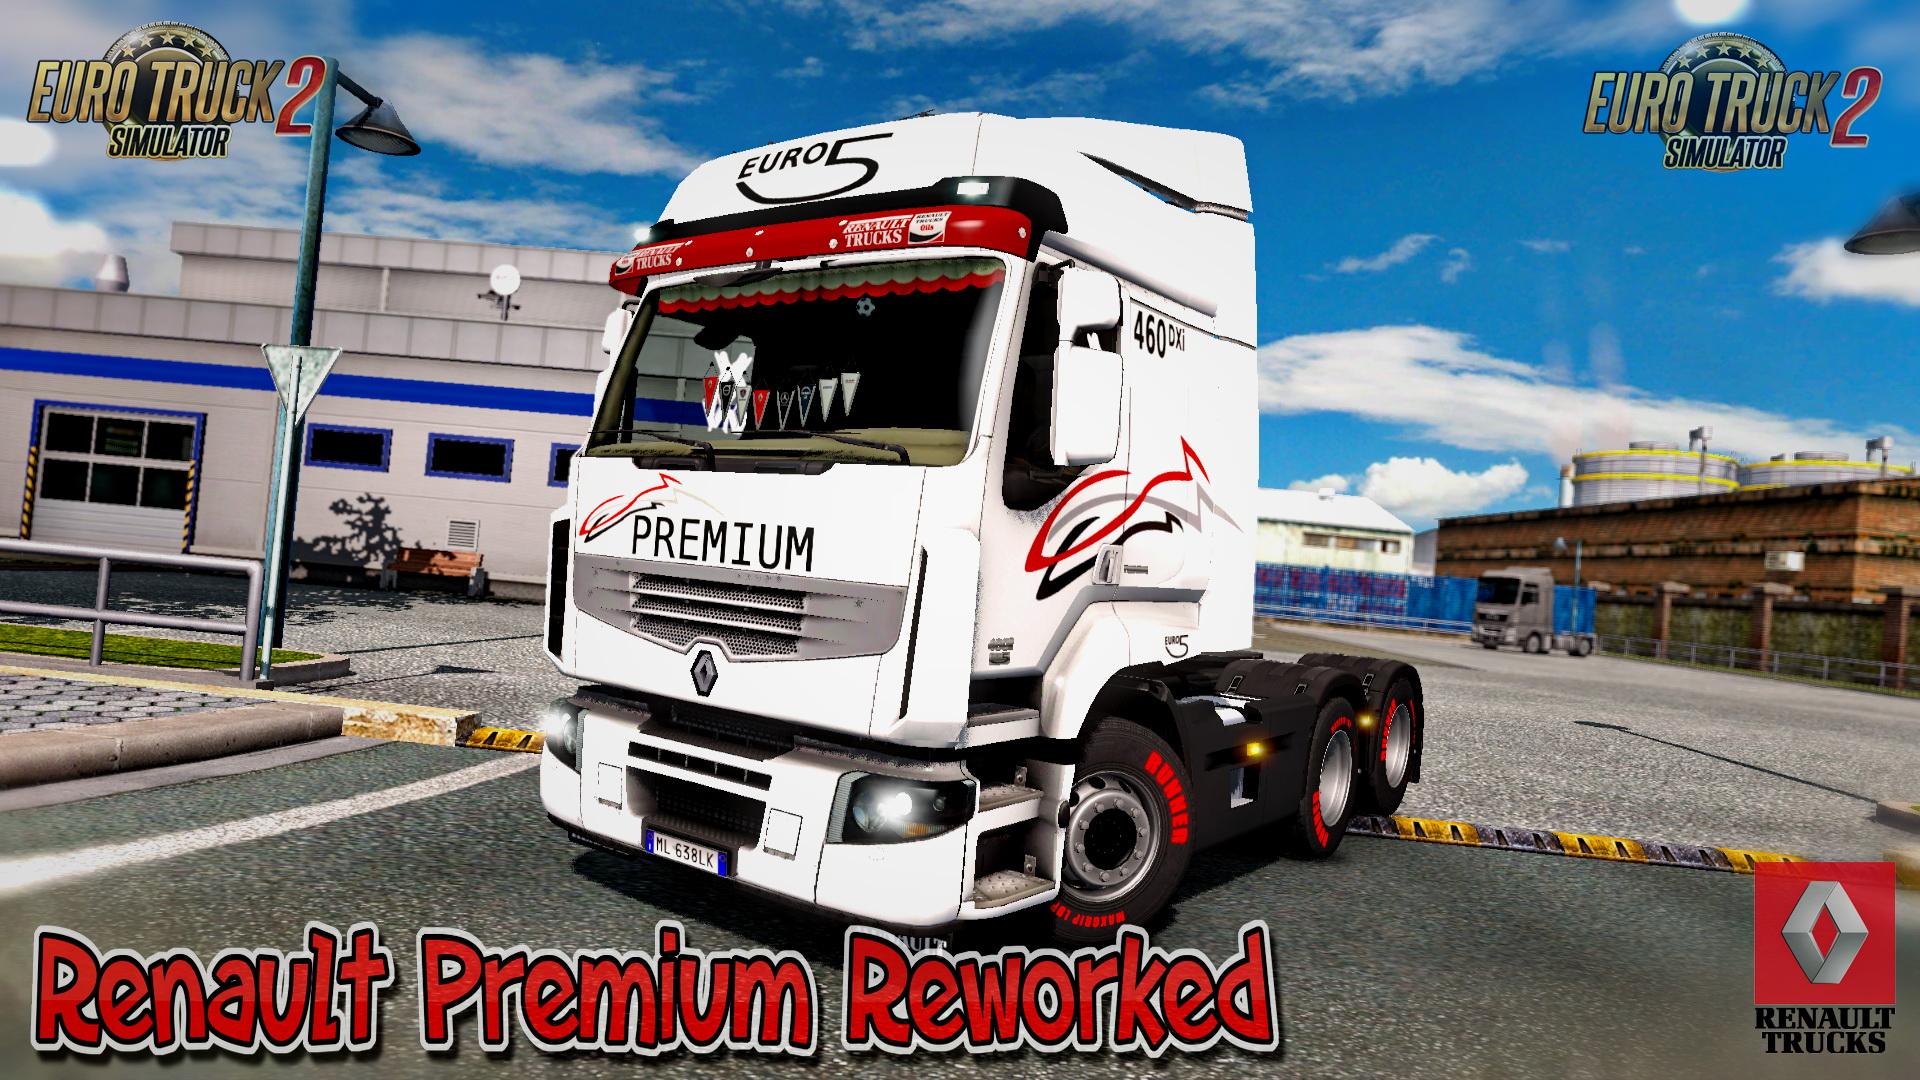 Renault Premium Reworked v4.7 by Schumi (1.35.x)